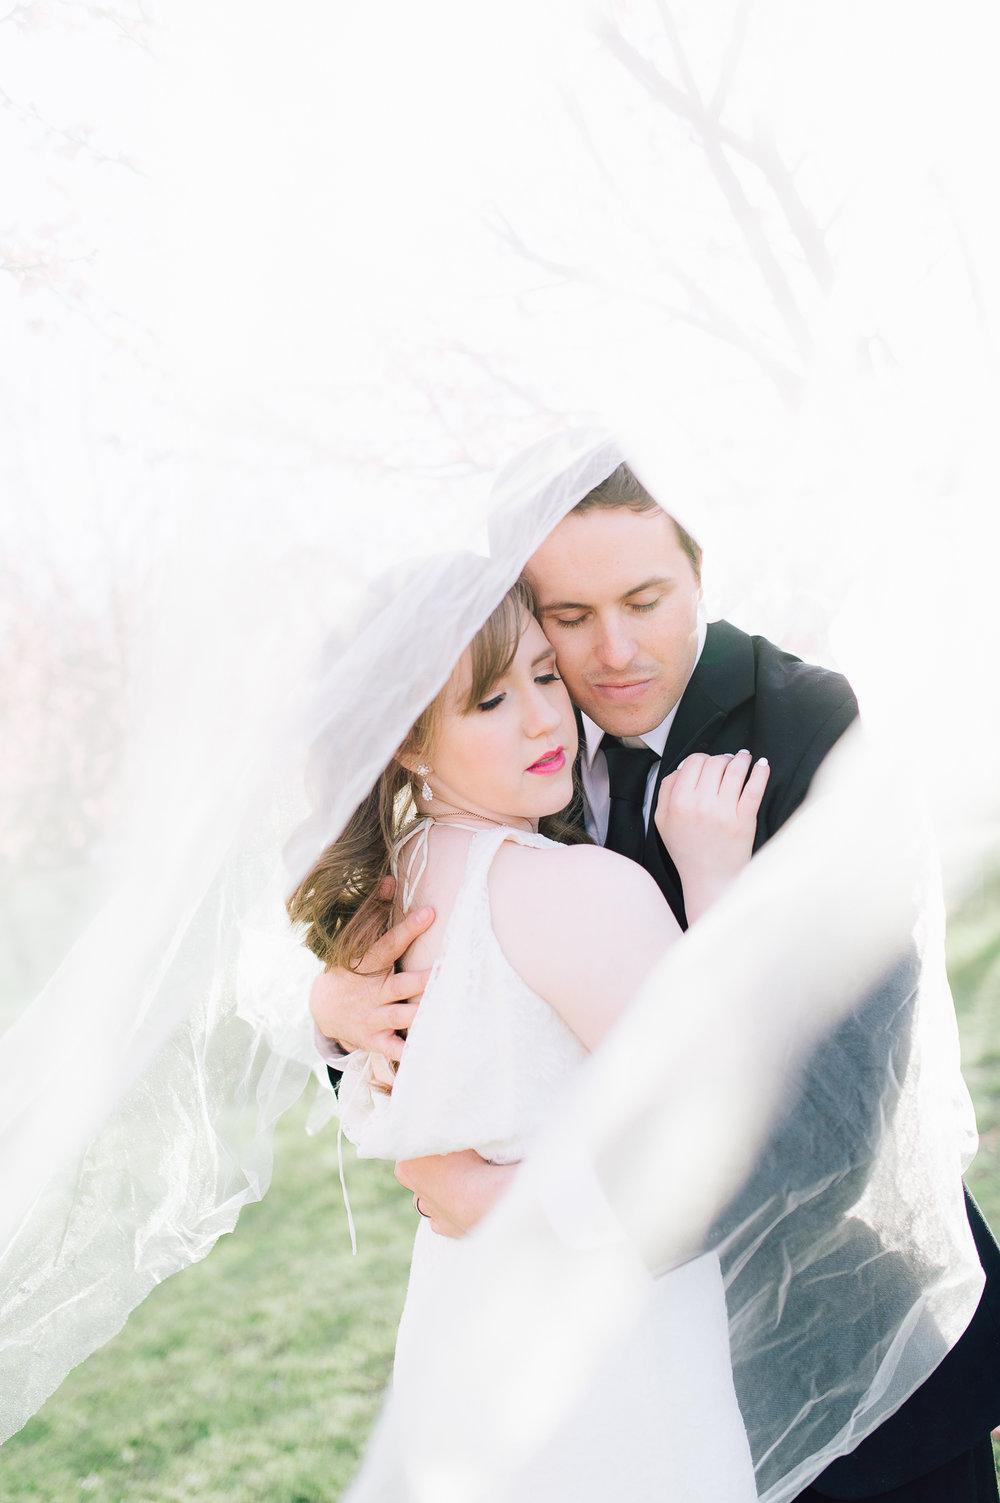 springwedding_cherryblossoms_virginiaphotographer_youseephotography_styledshoot (604).jpg